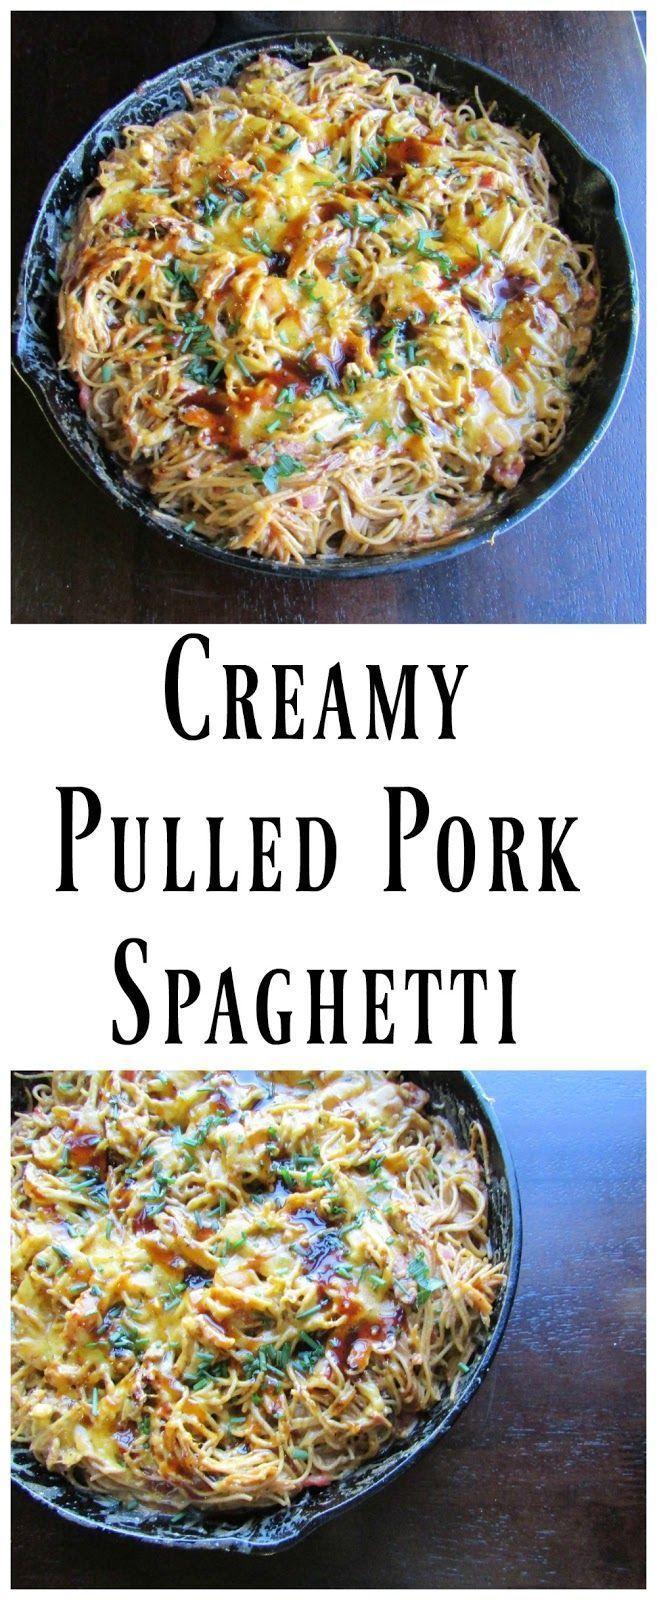 Creamy Pulled Pork Spaghetti